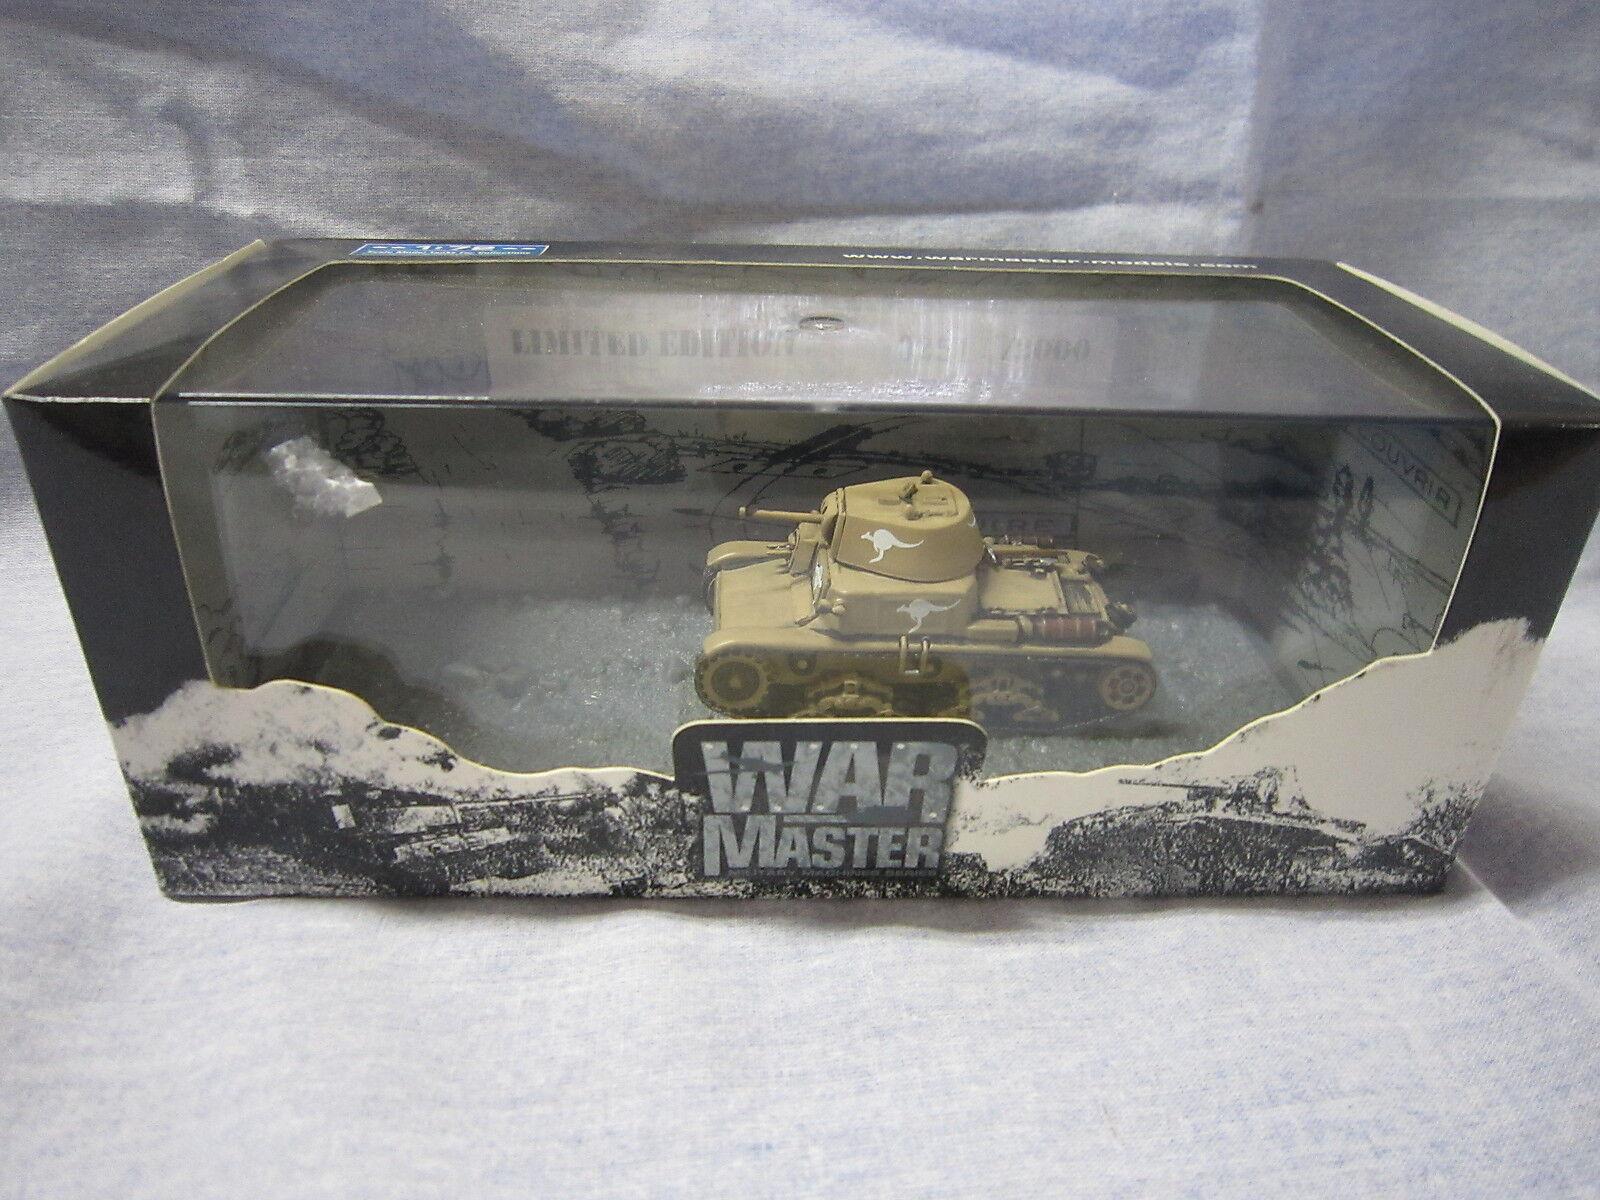 ZA008 WAR MASTER FIAT M13-40 ROYAL AUSTRALIA Libya 1942 1 72 TK0002 Ed Lim NB